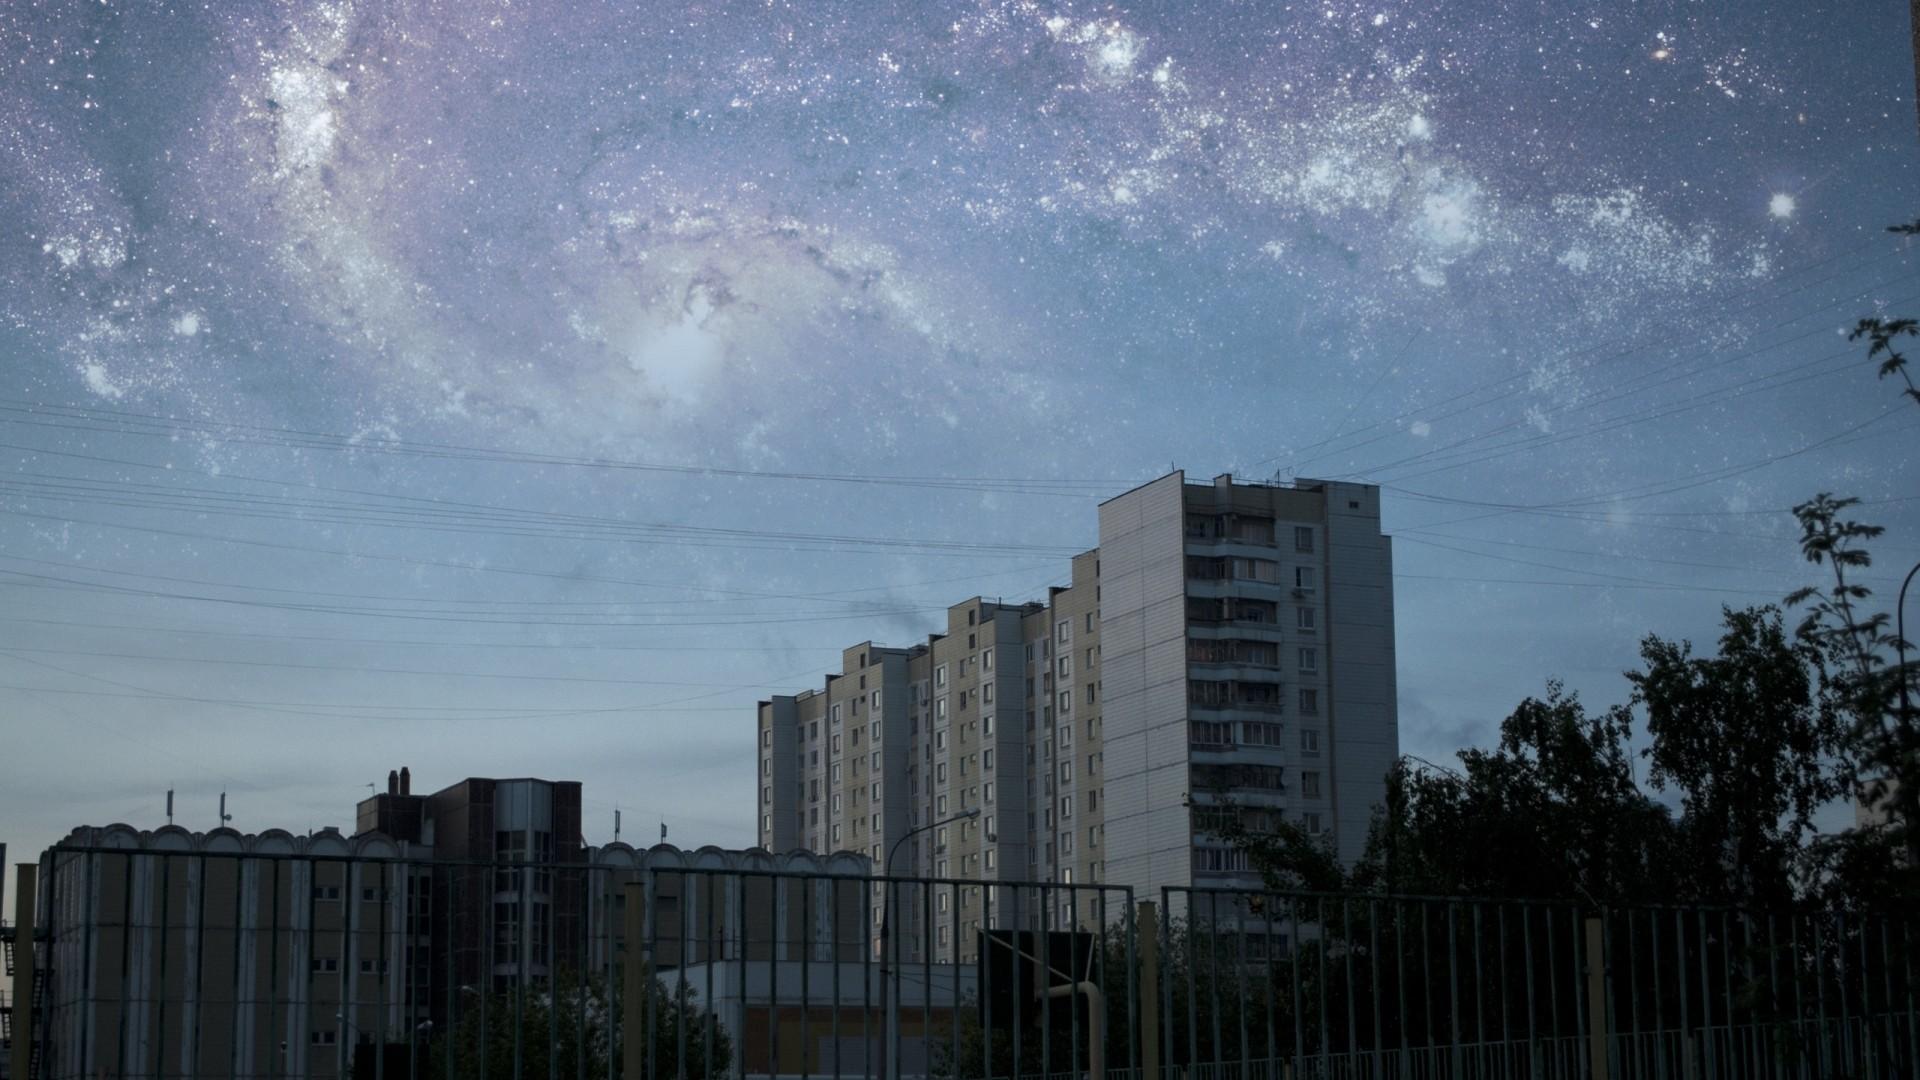 Wallpaper city, sky, photoshop, stars